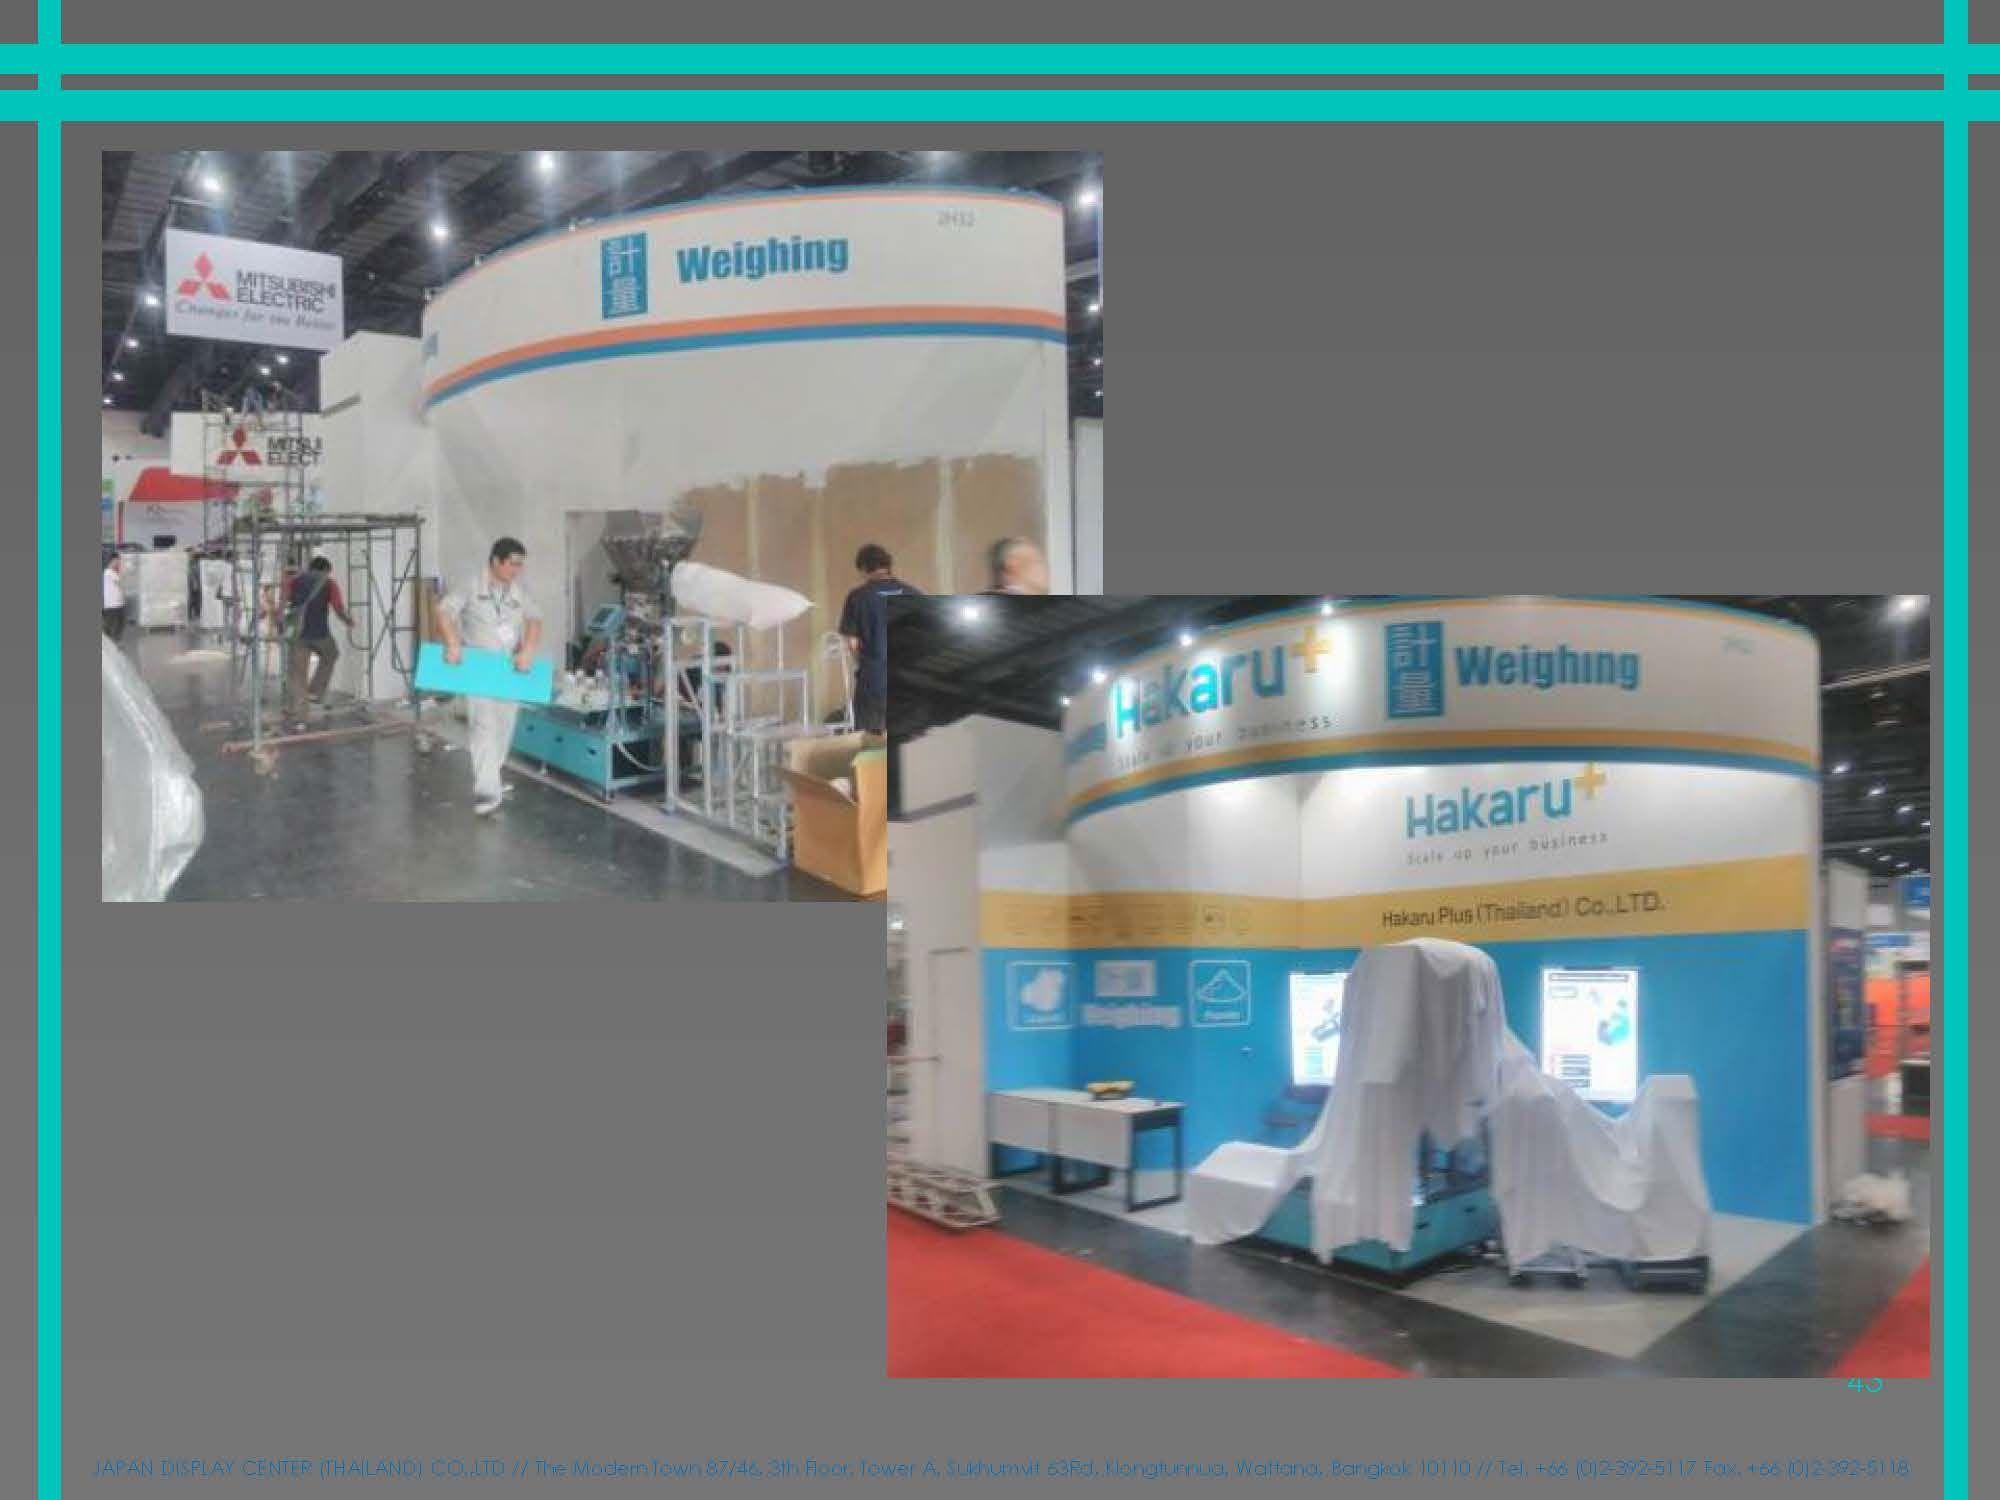 Exhibition Stand Builders Thailand : Japan display center thailand co ltd